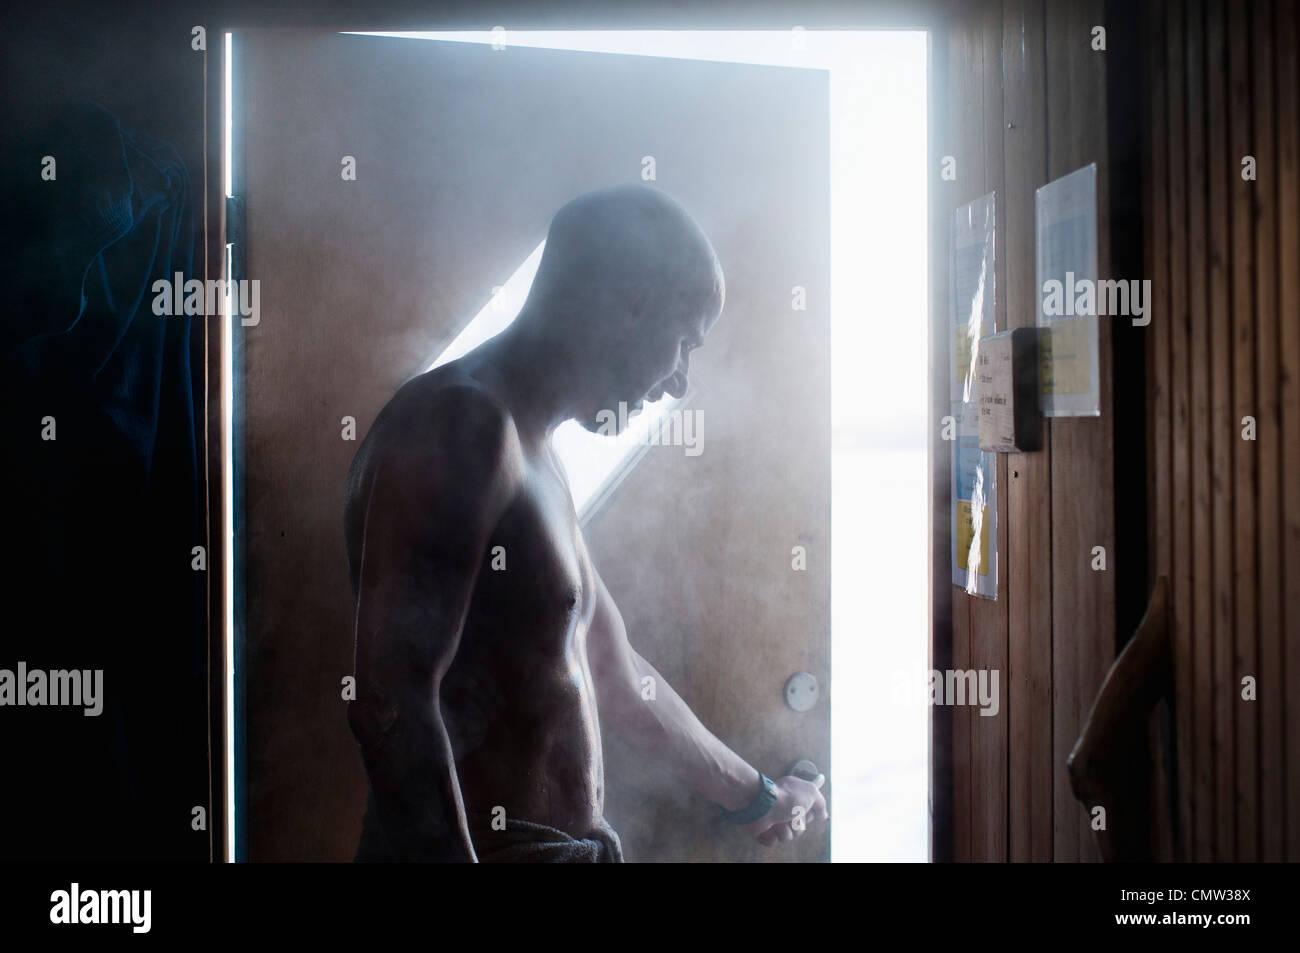 sauna stockfotos sauna bilder alamy. Black Bedroom Furniture Sets. Home Design Ideas